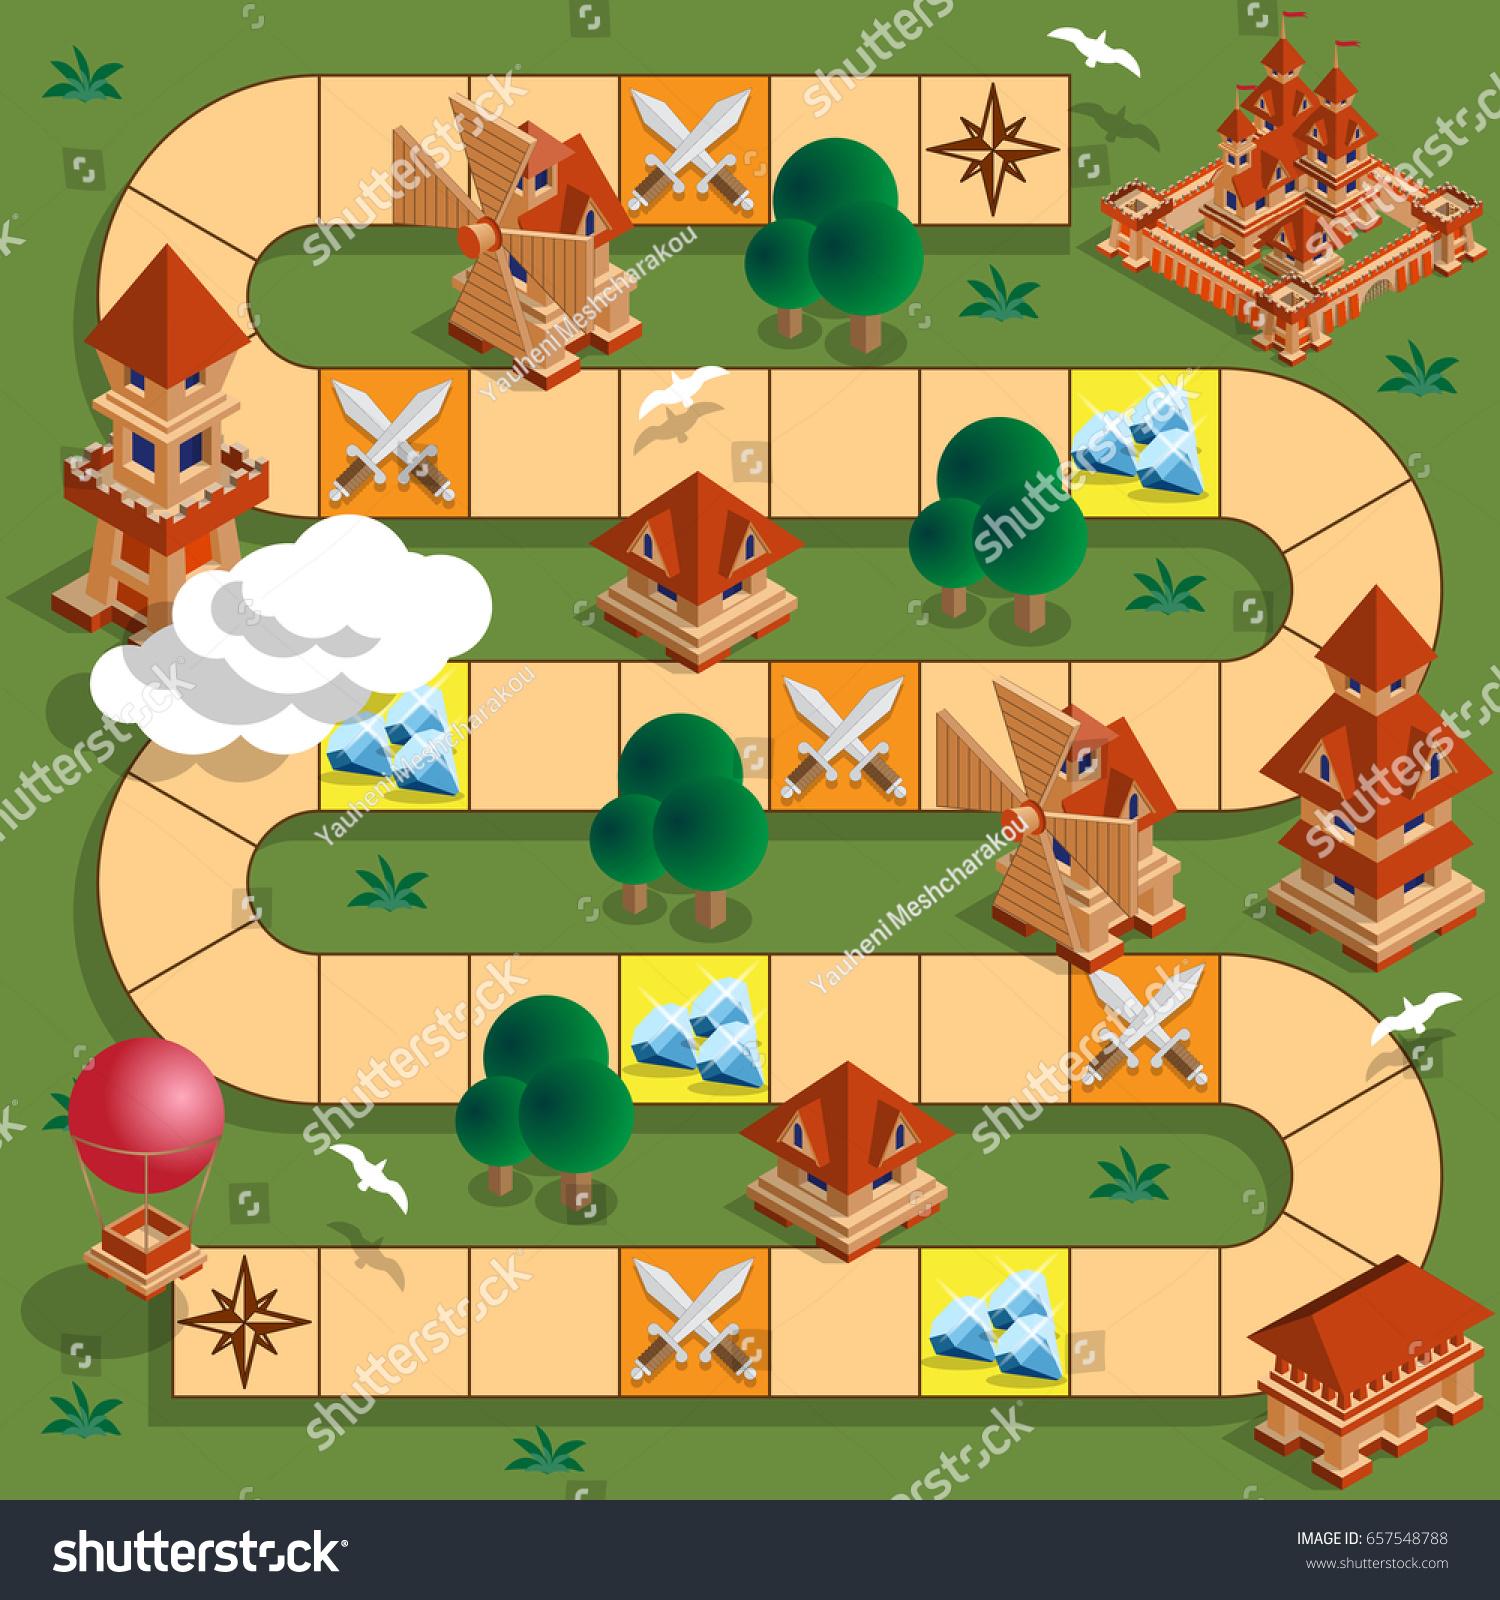 Board Game Medieval Theme Vector Design Stock Vector Royalty Free - Board game design